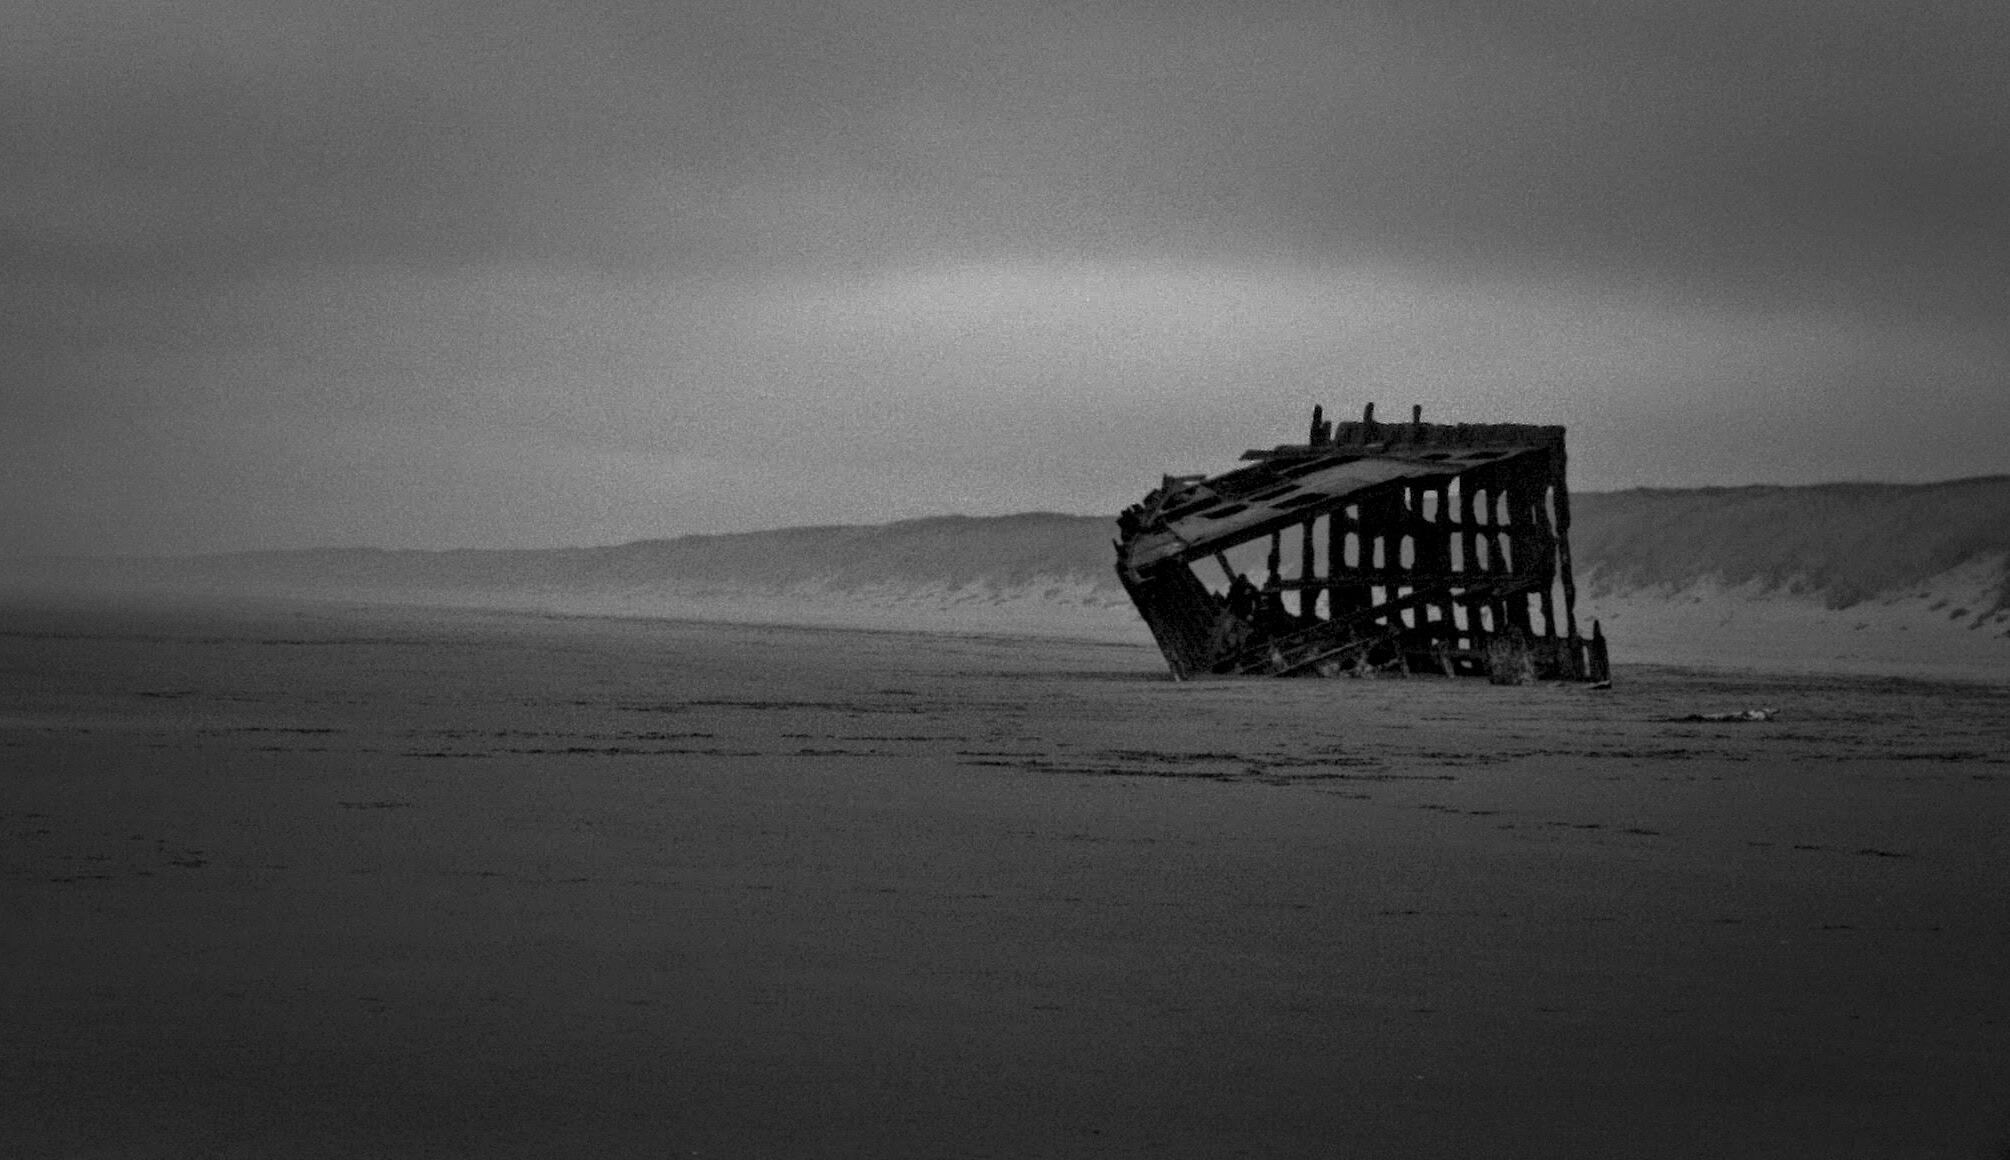 Ship Wreckage by Joshua Kliewer